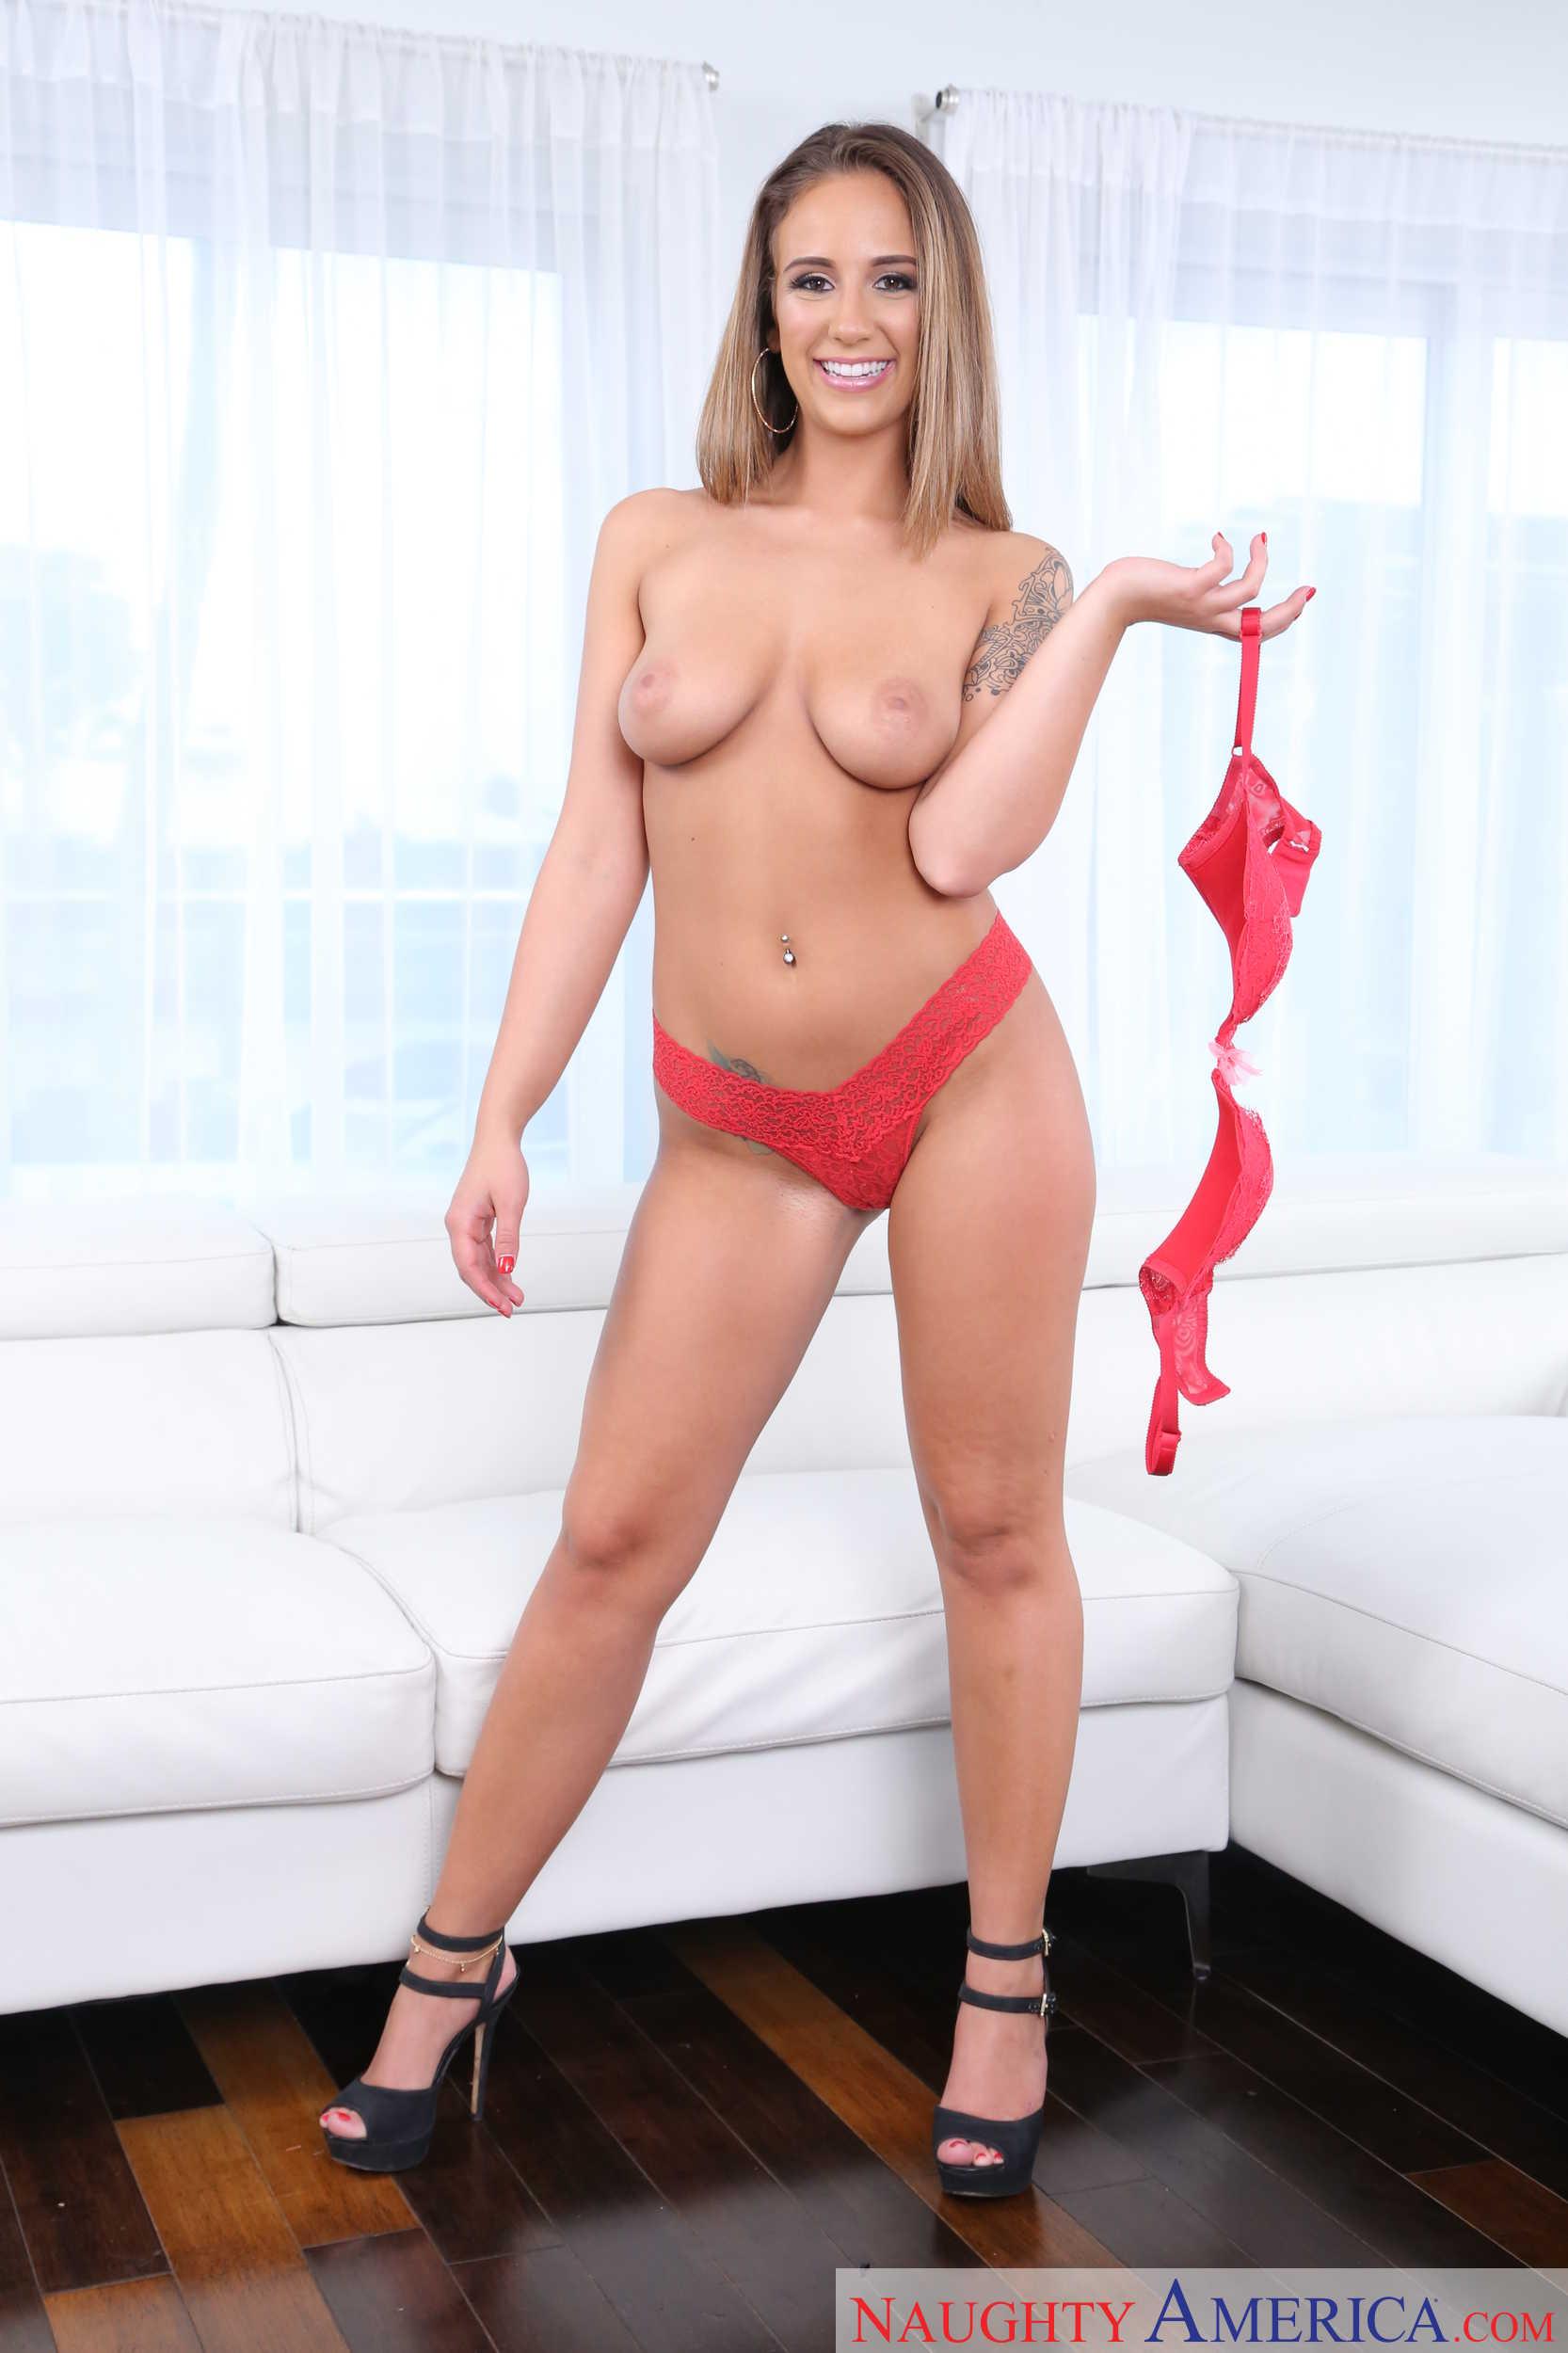 Layla London muestra su conchita impresionante